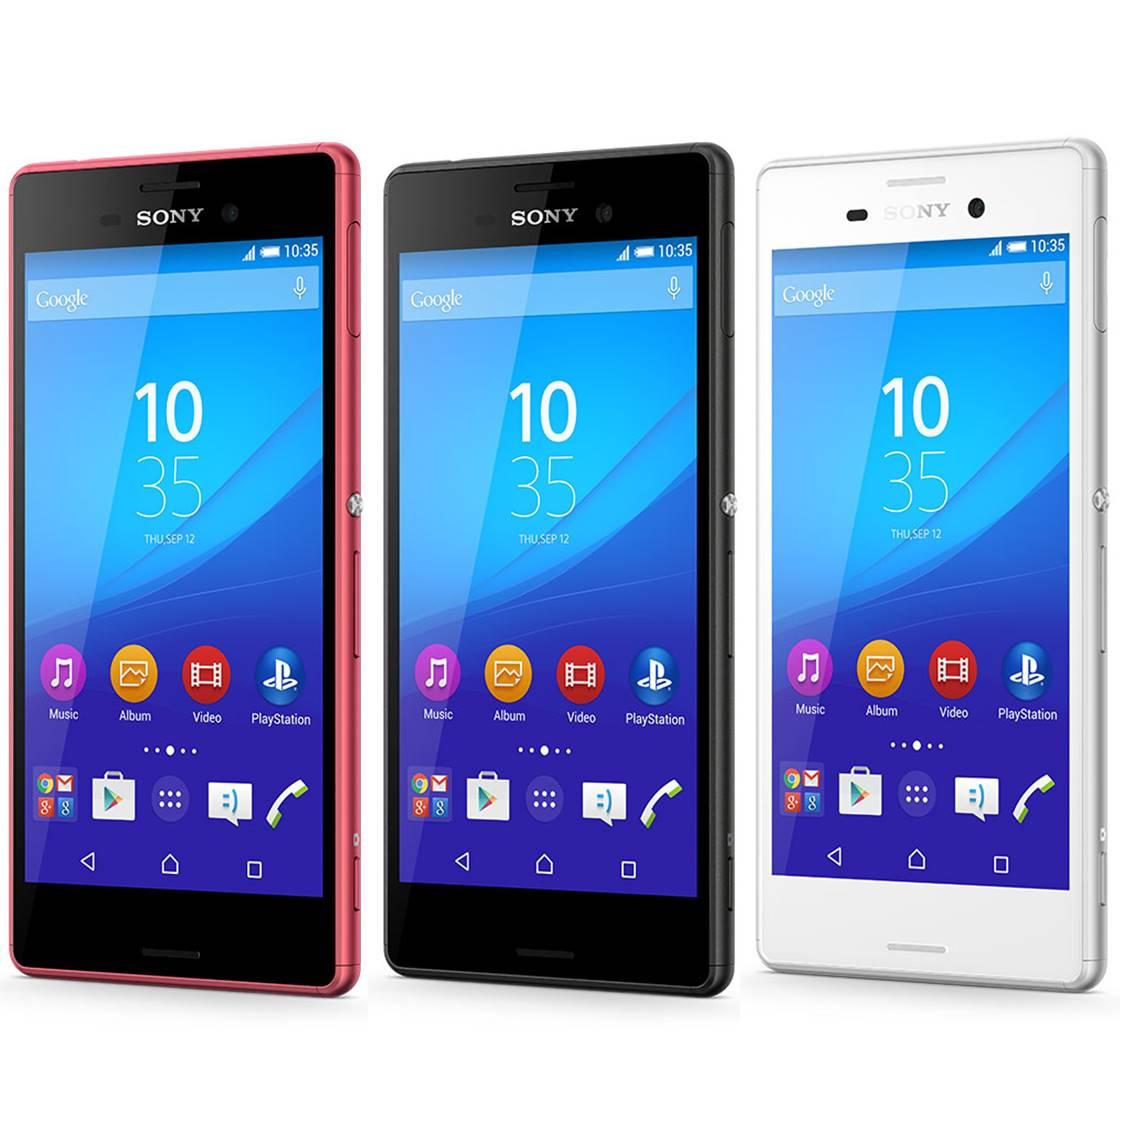 Sony Xperia M4 Aqua Full Specifications